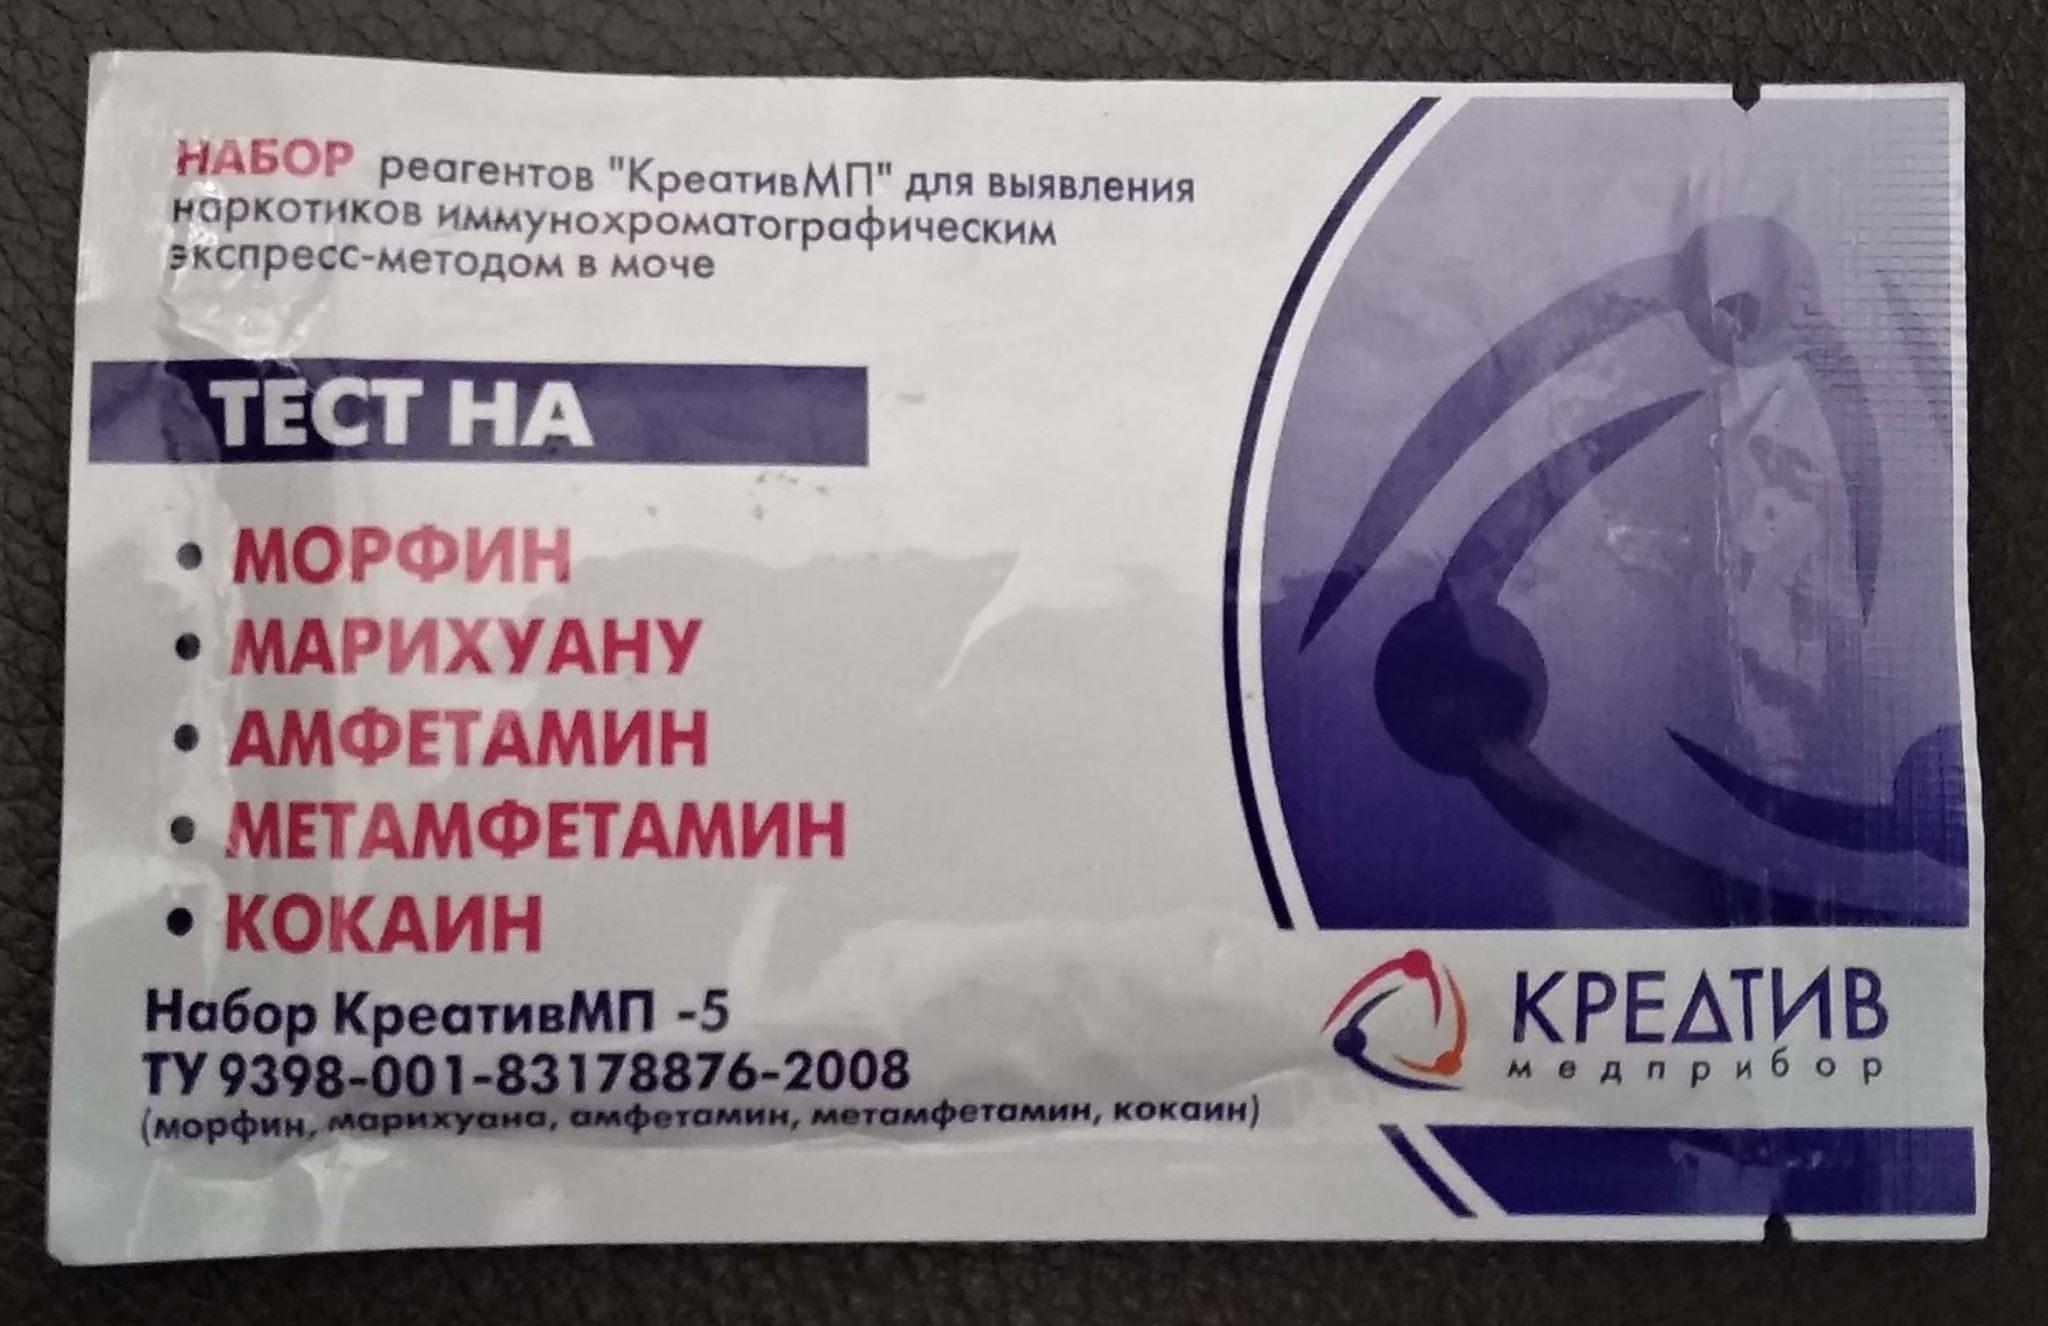 Освидетельствование на наркотическое опьянение. Освидетельствование на наркотики в Беларуси